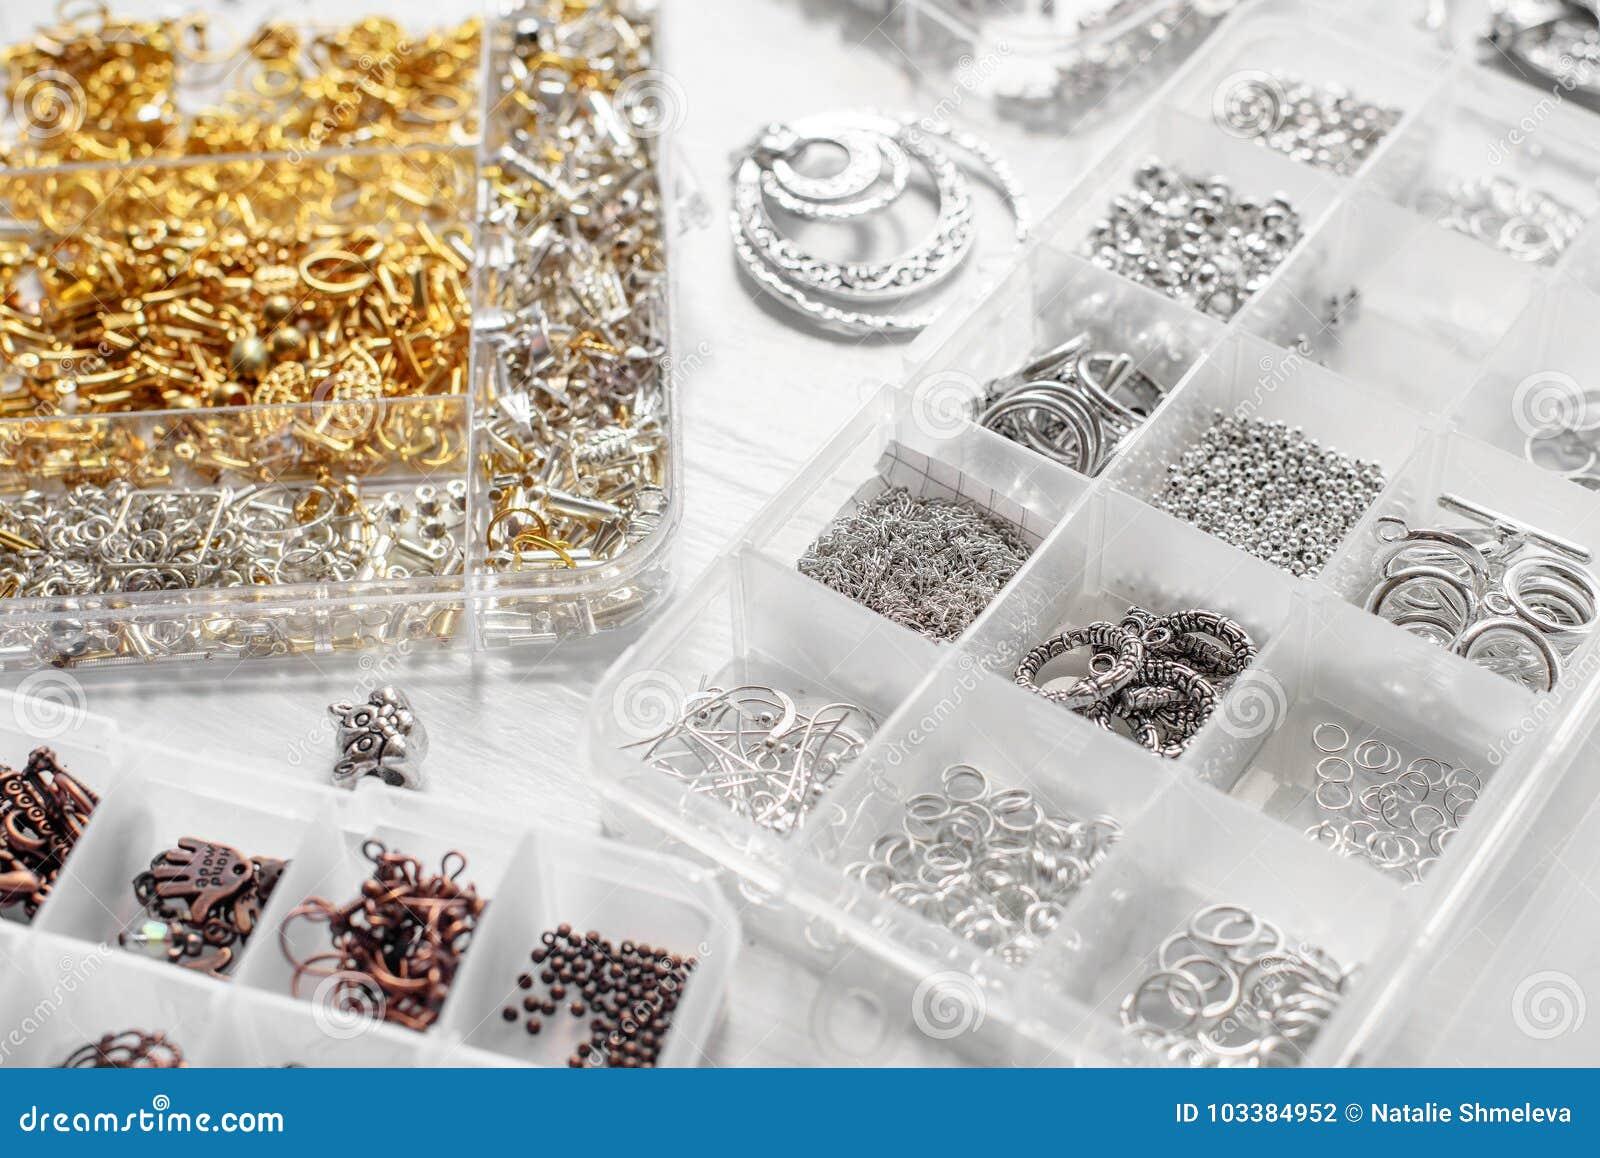 Metale dla bijoux